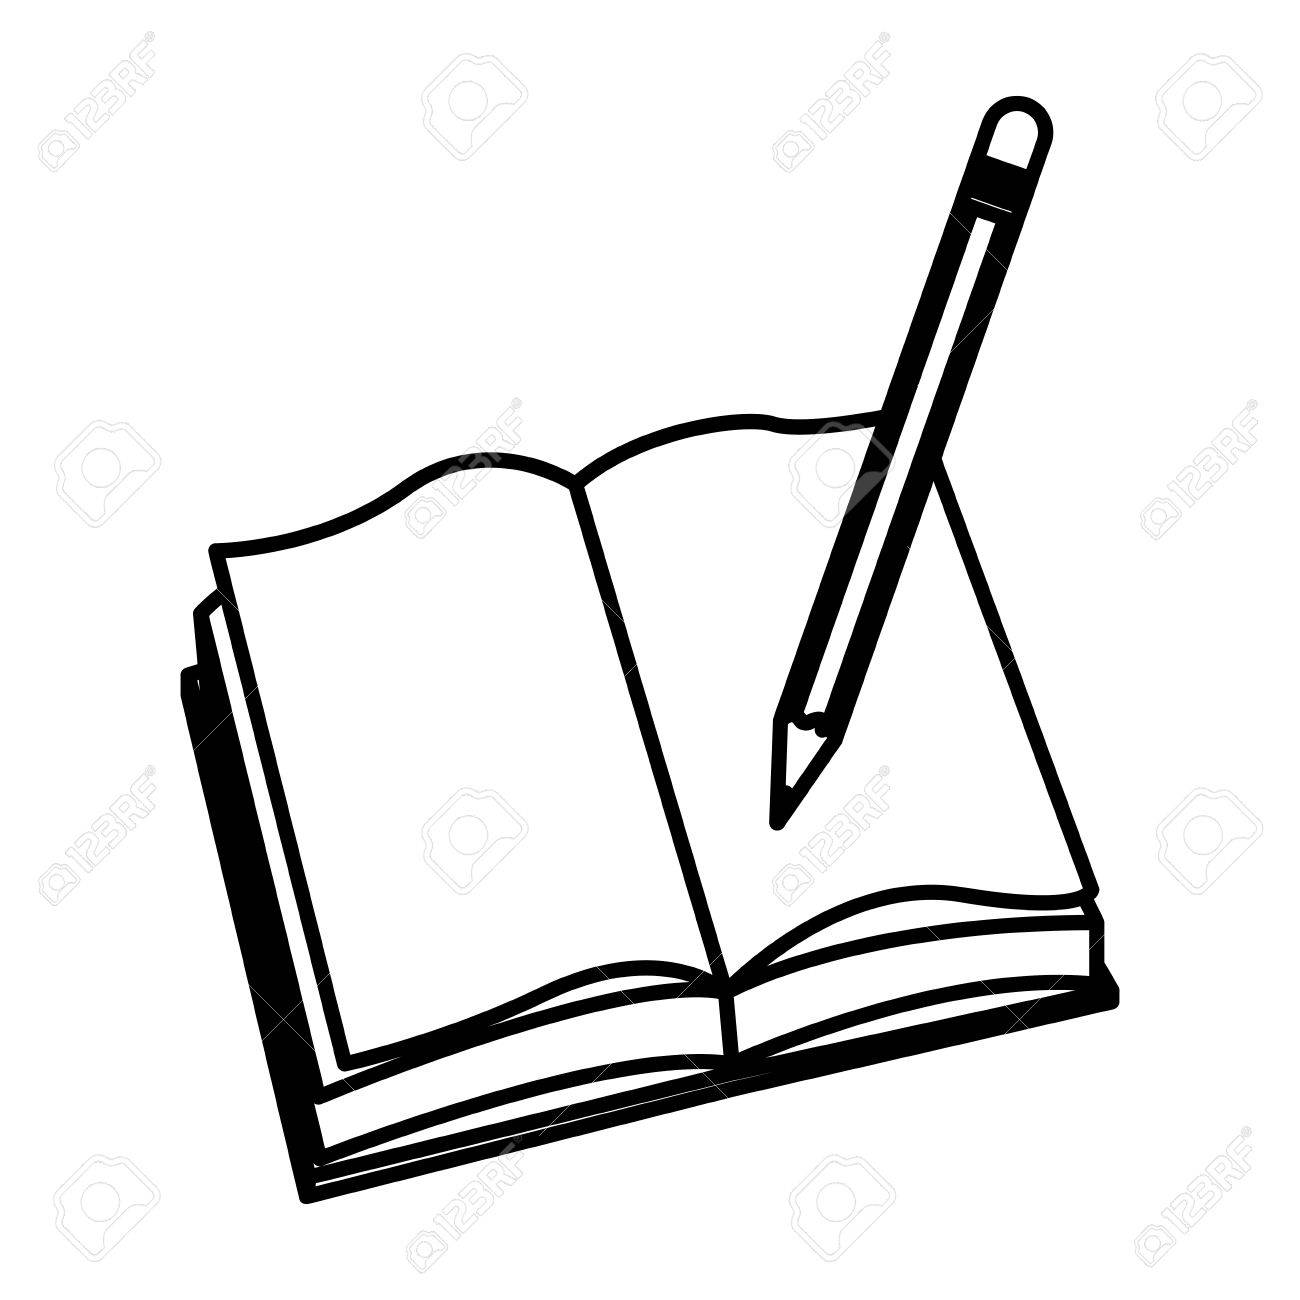 1300x1300 Open Book Pencil Write School Image Vector Illustration Royalty